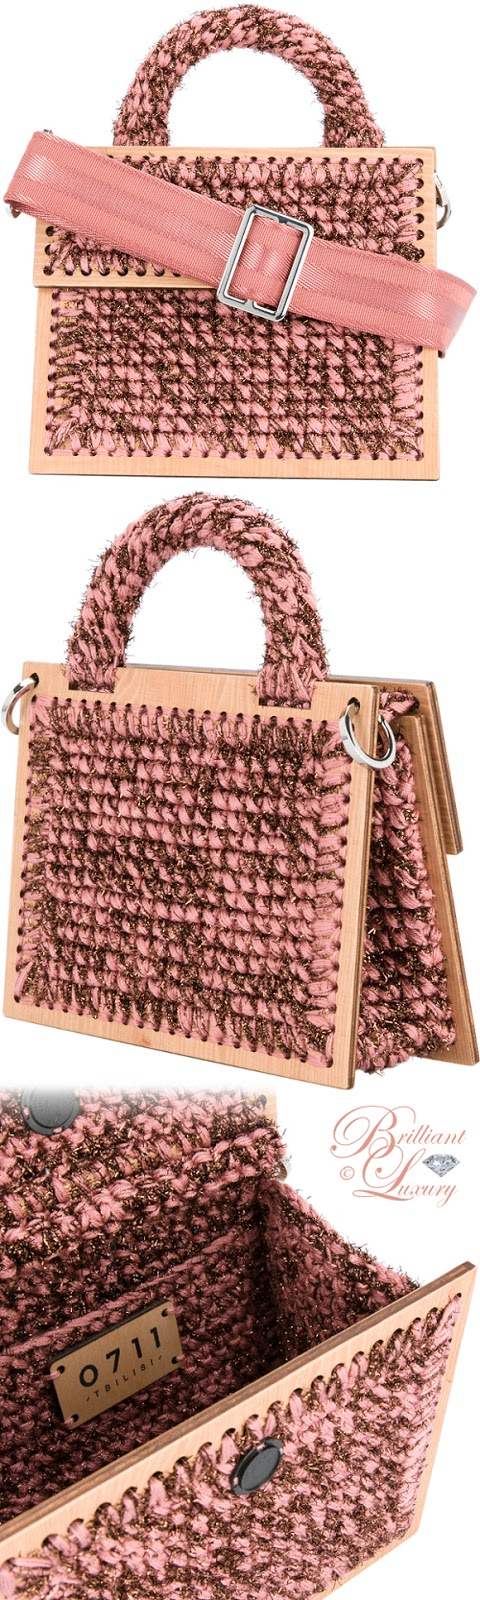 Brilliant Luxury ♦ 711 Michel Copacabana macramé crossbody bag